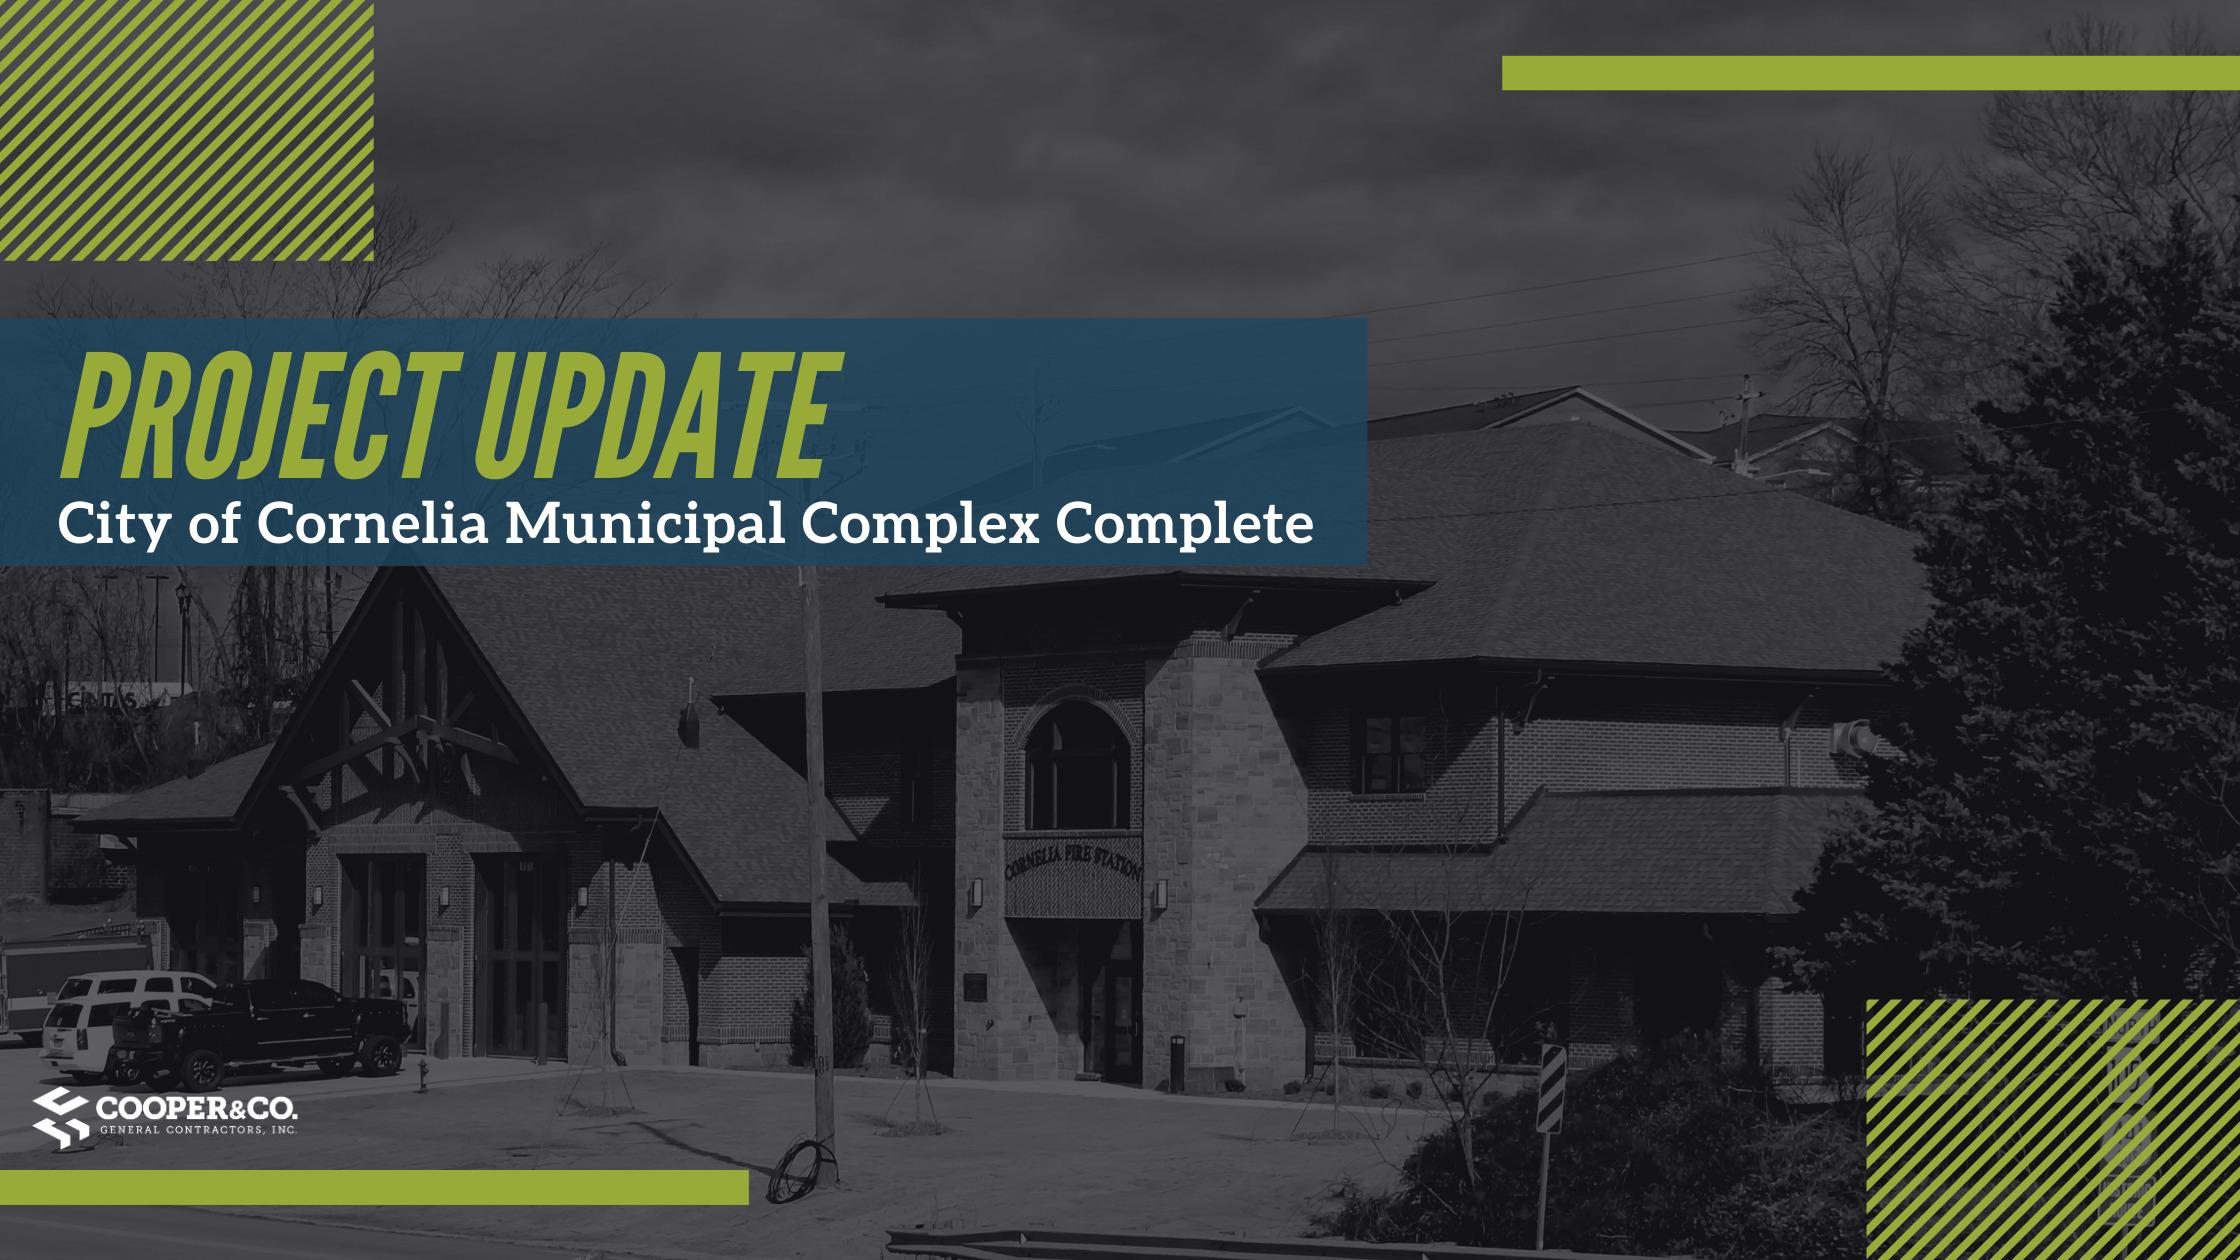 Project Update: City of Cornelia Municipal Complex Complete